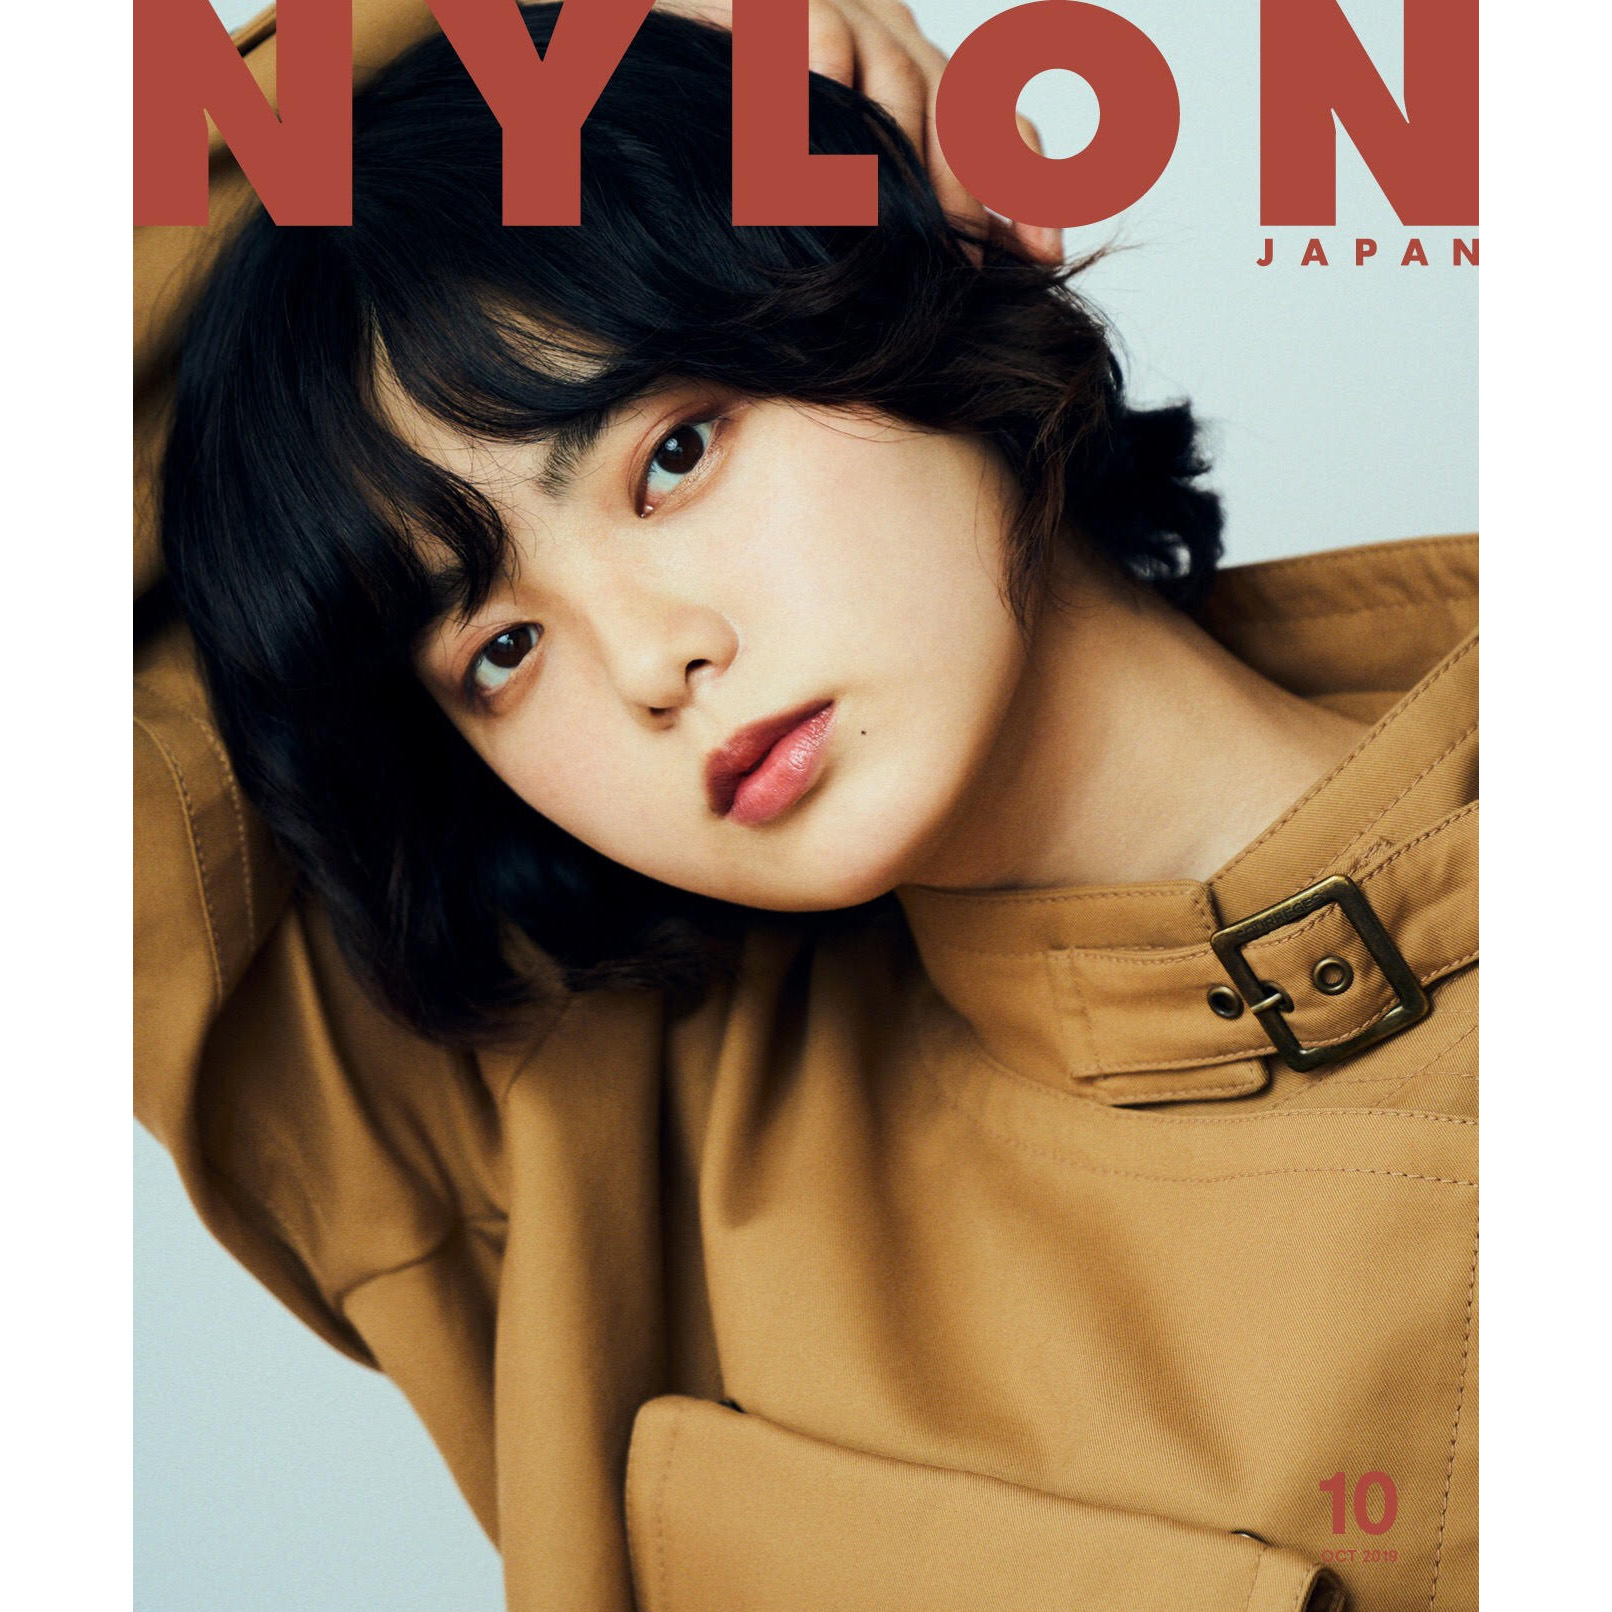 NYLON JAPAN 8/28 発売10月号 《平手友梨奈(欅坂46)》がソロ表紙で初登場 笑顔も見せた16P 中面+ 両面ポスター付録付き